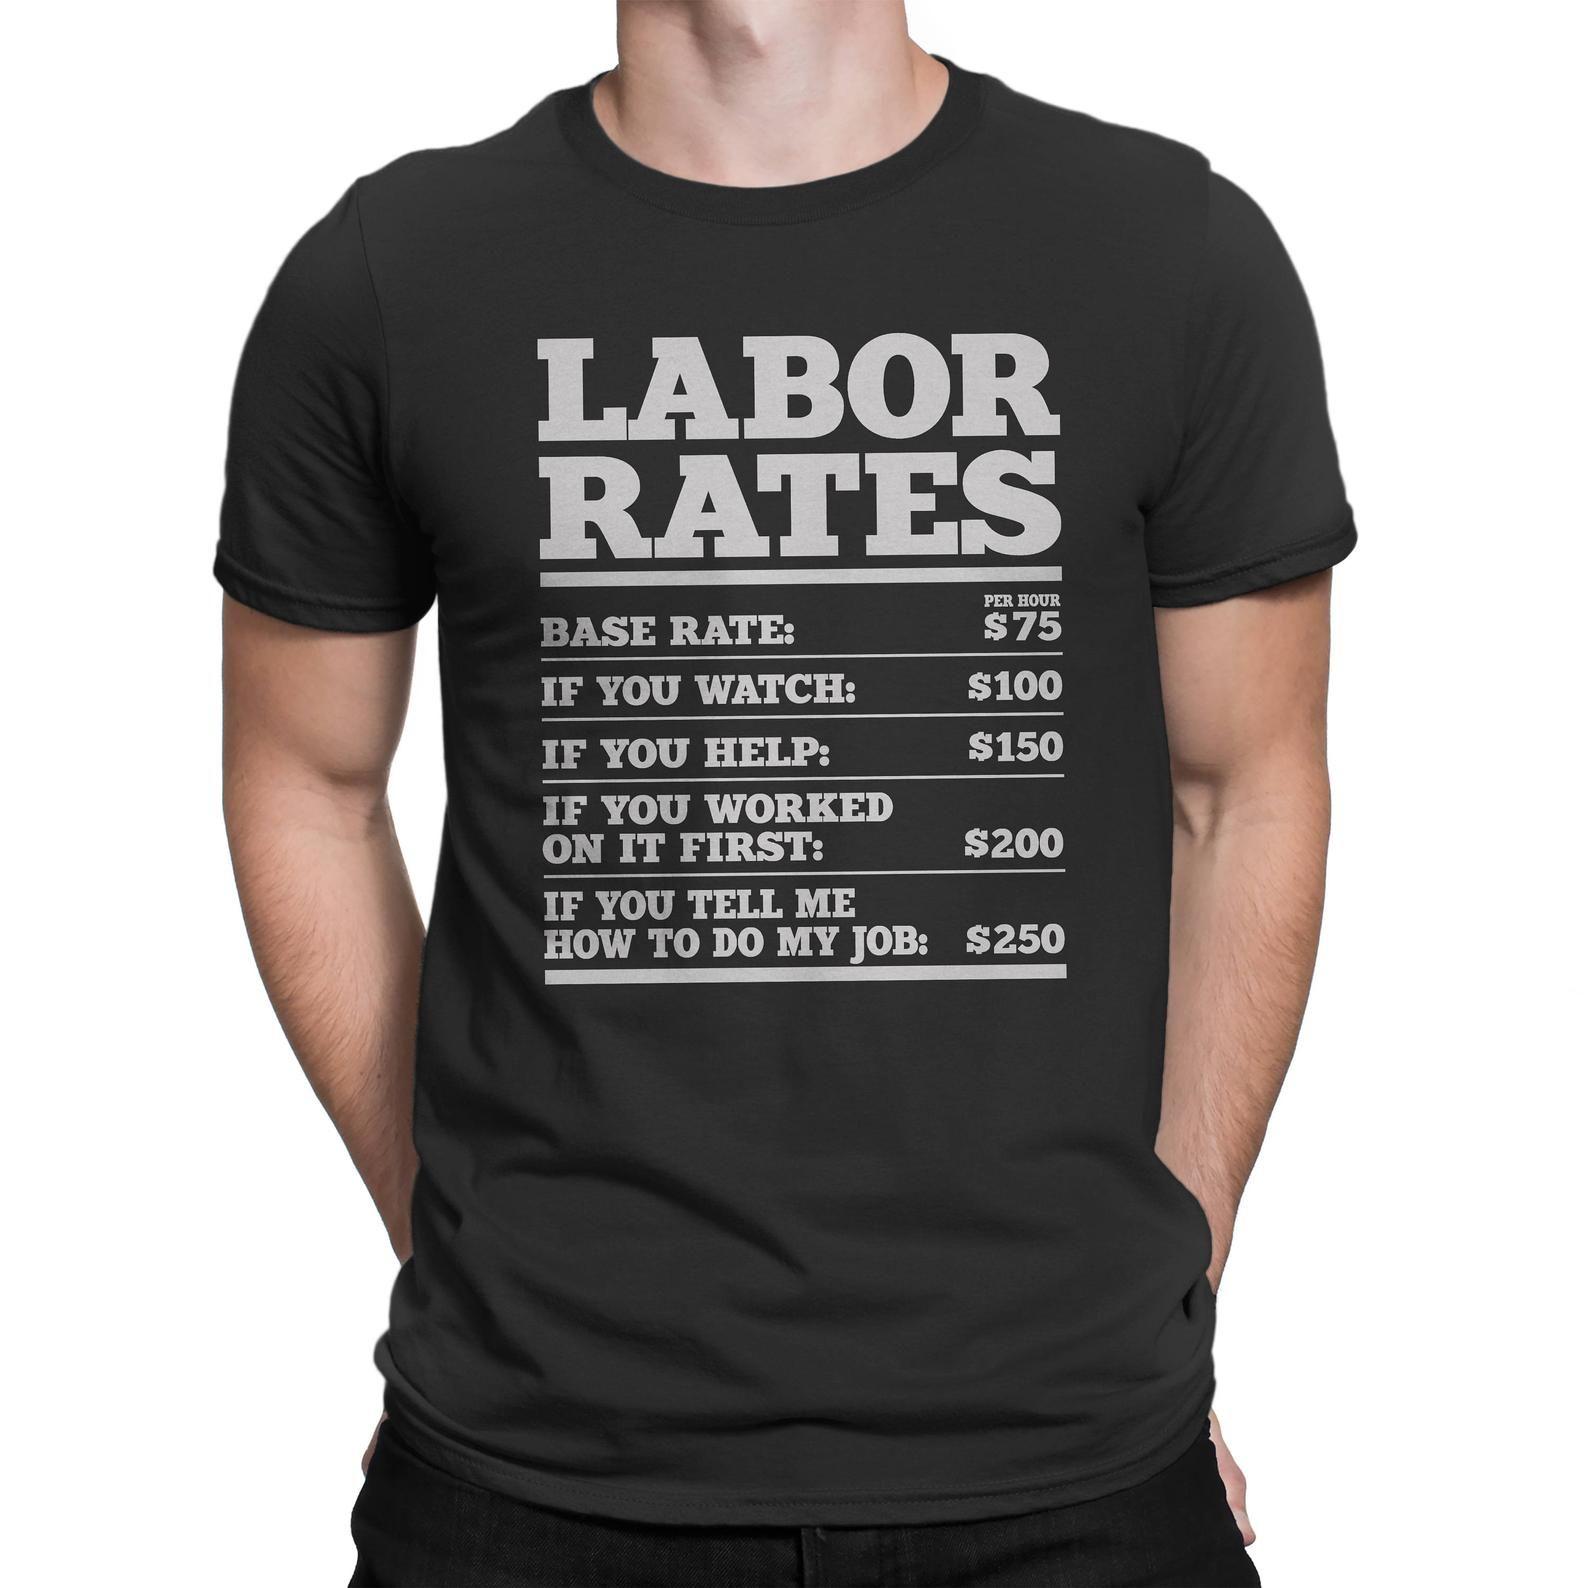 Plumber Hourly Rate Funny Plumbing Worker Labor Men Gifts ...  Funny Plumber Labor Rate Signs